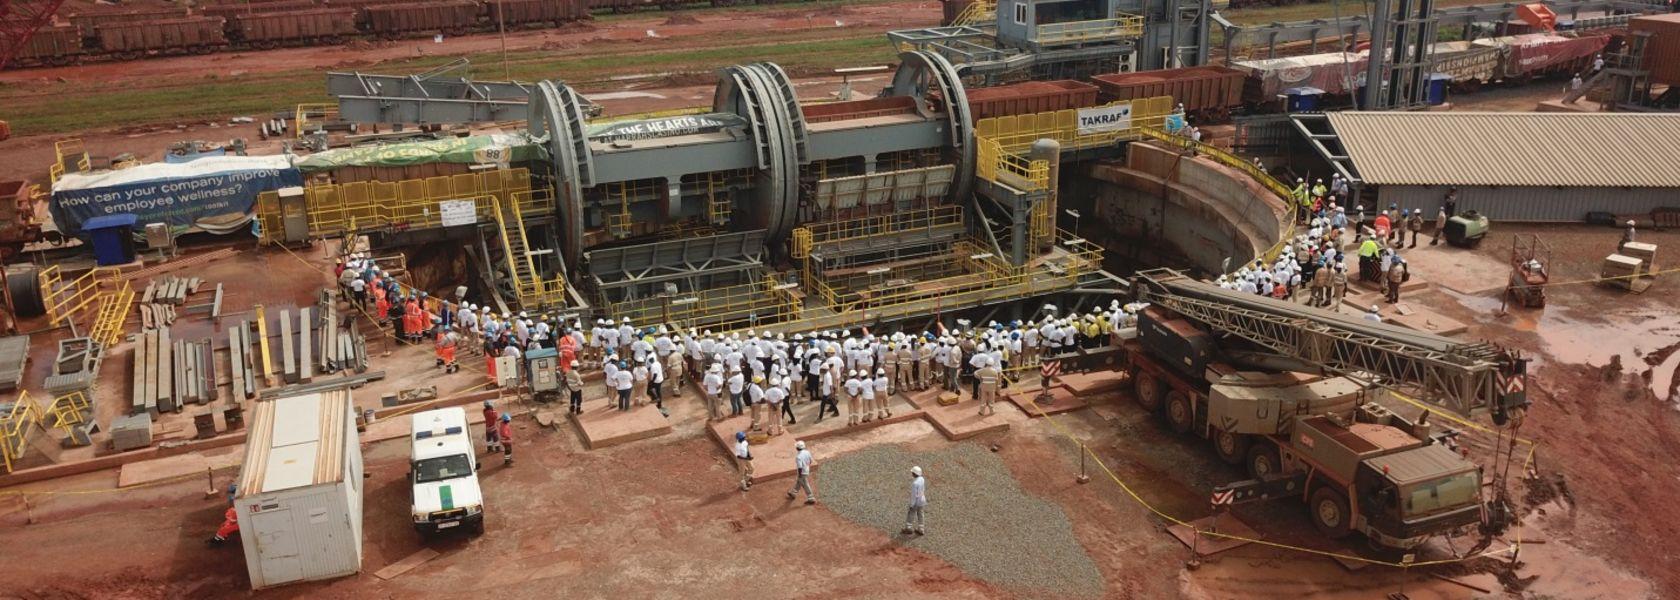 Fluor helps CBG bauxite project achieve milestone - Mining Magazine